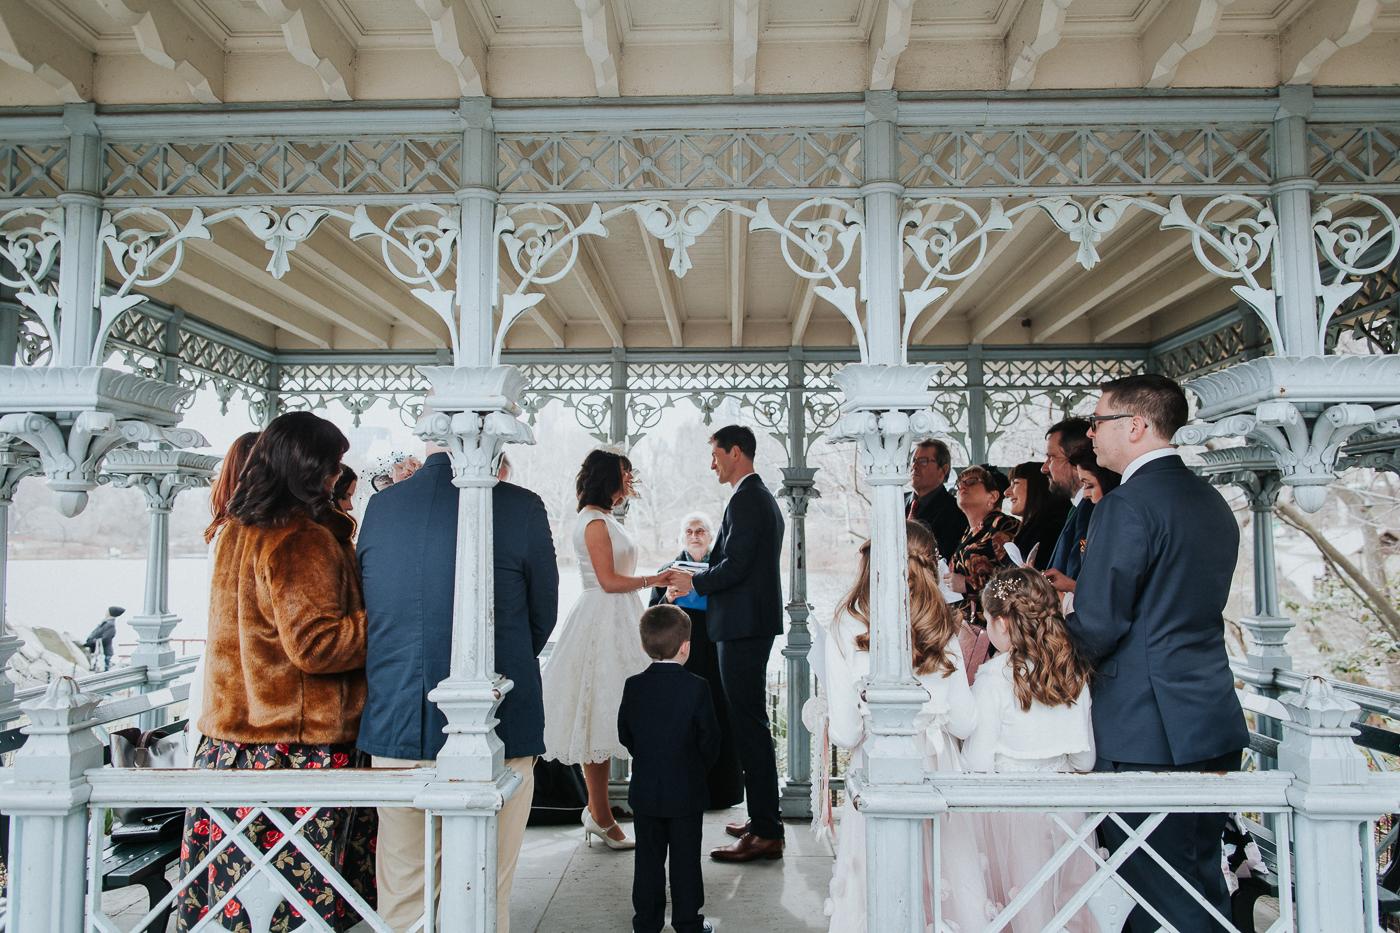 Ladies-Pavilion-Central-Park-NYC-Documentary-Elopement-Wedding-Photographer-32.jpg